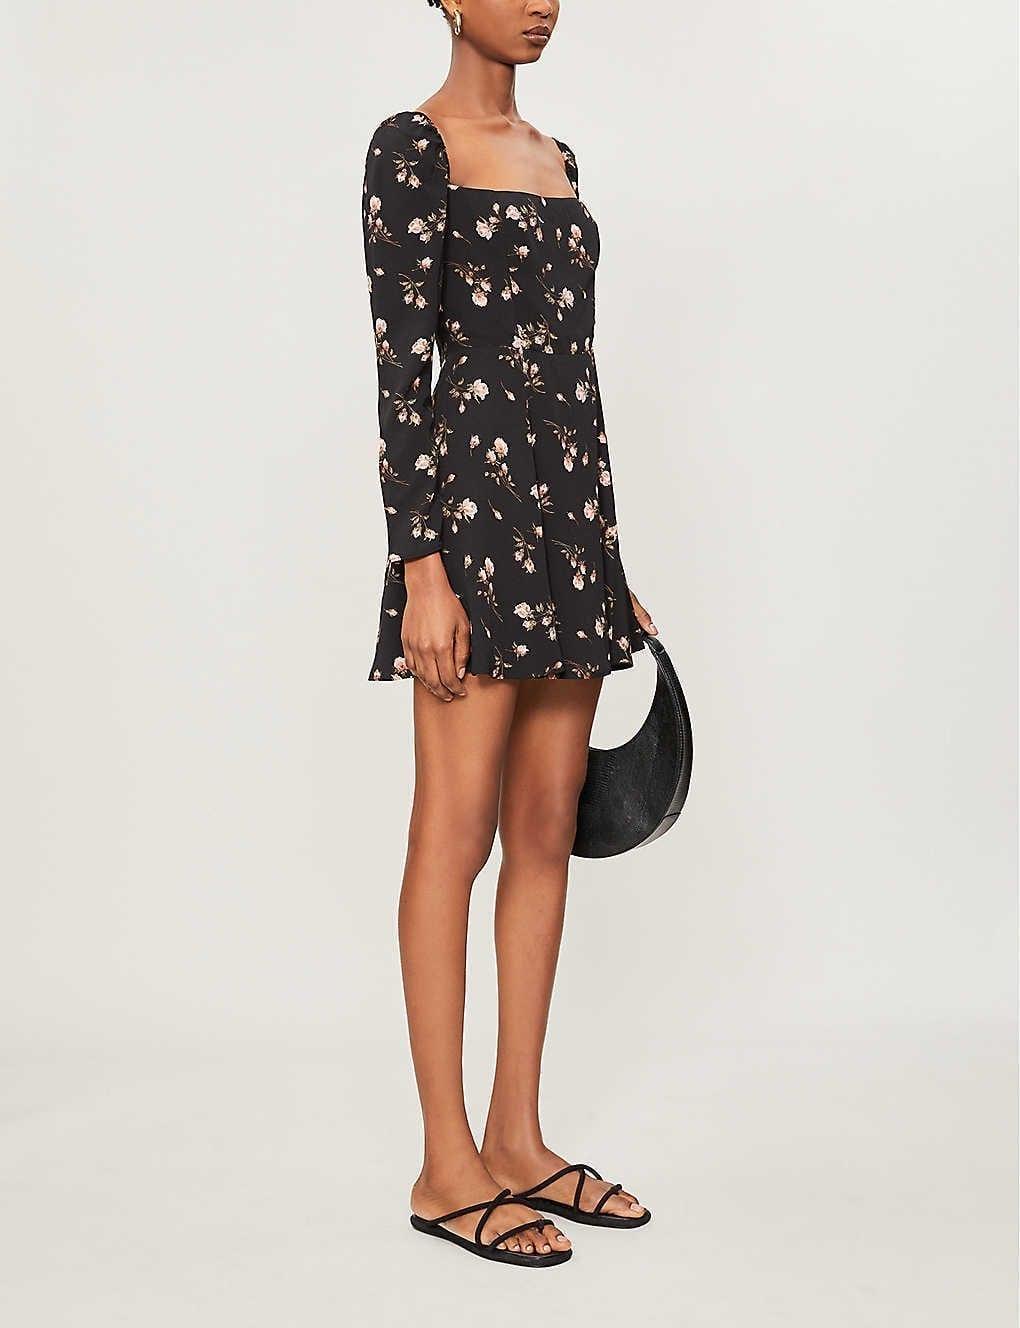 REFORMATION Floral-print Crepe Mini Dress